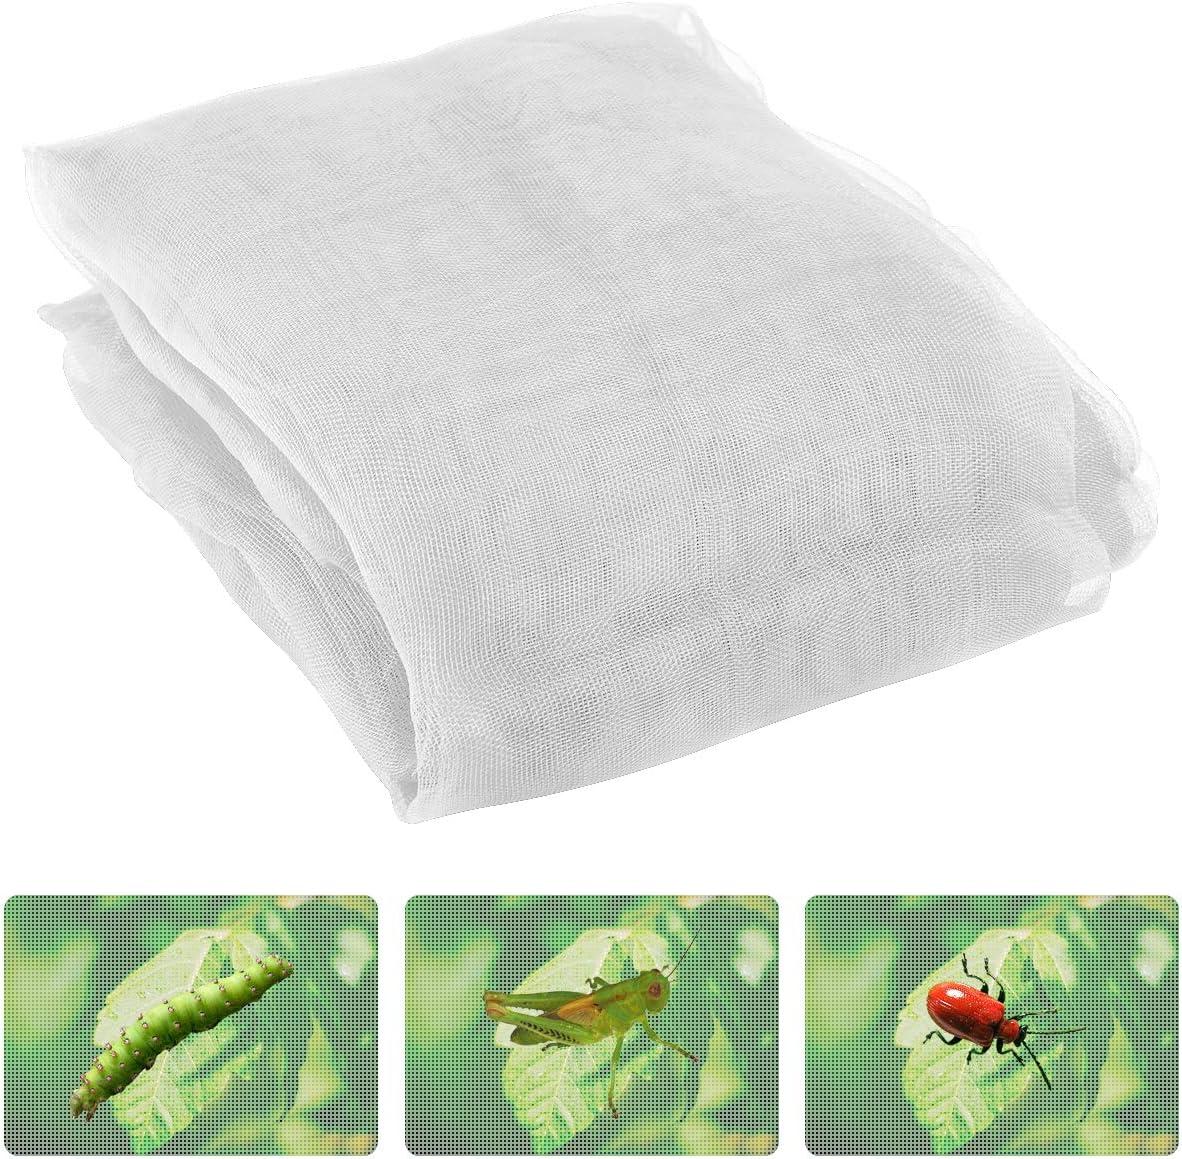 Anphisn 2 Pack Garden Insect Screen Insect Barrier Netting Mesh Bird Netting 9.8ft 6.5 ft White